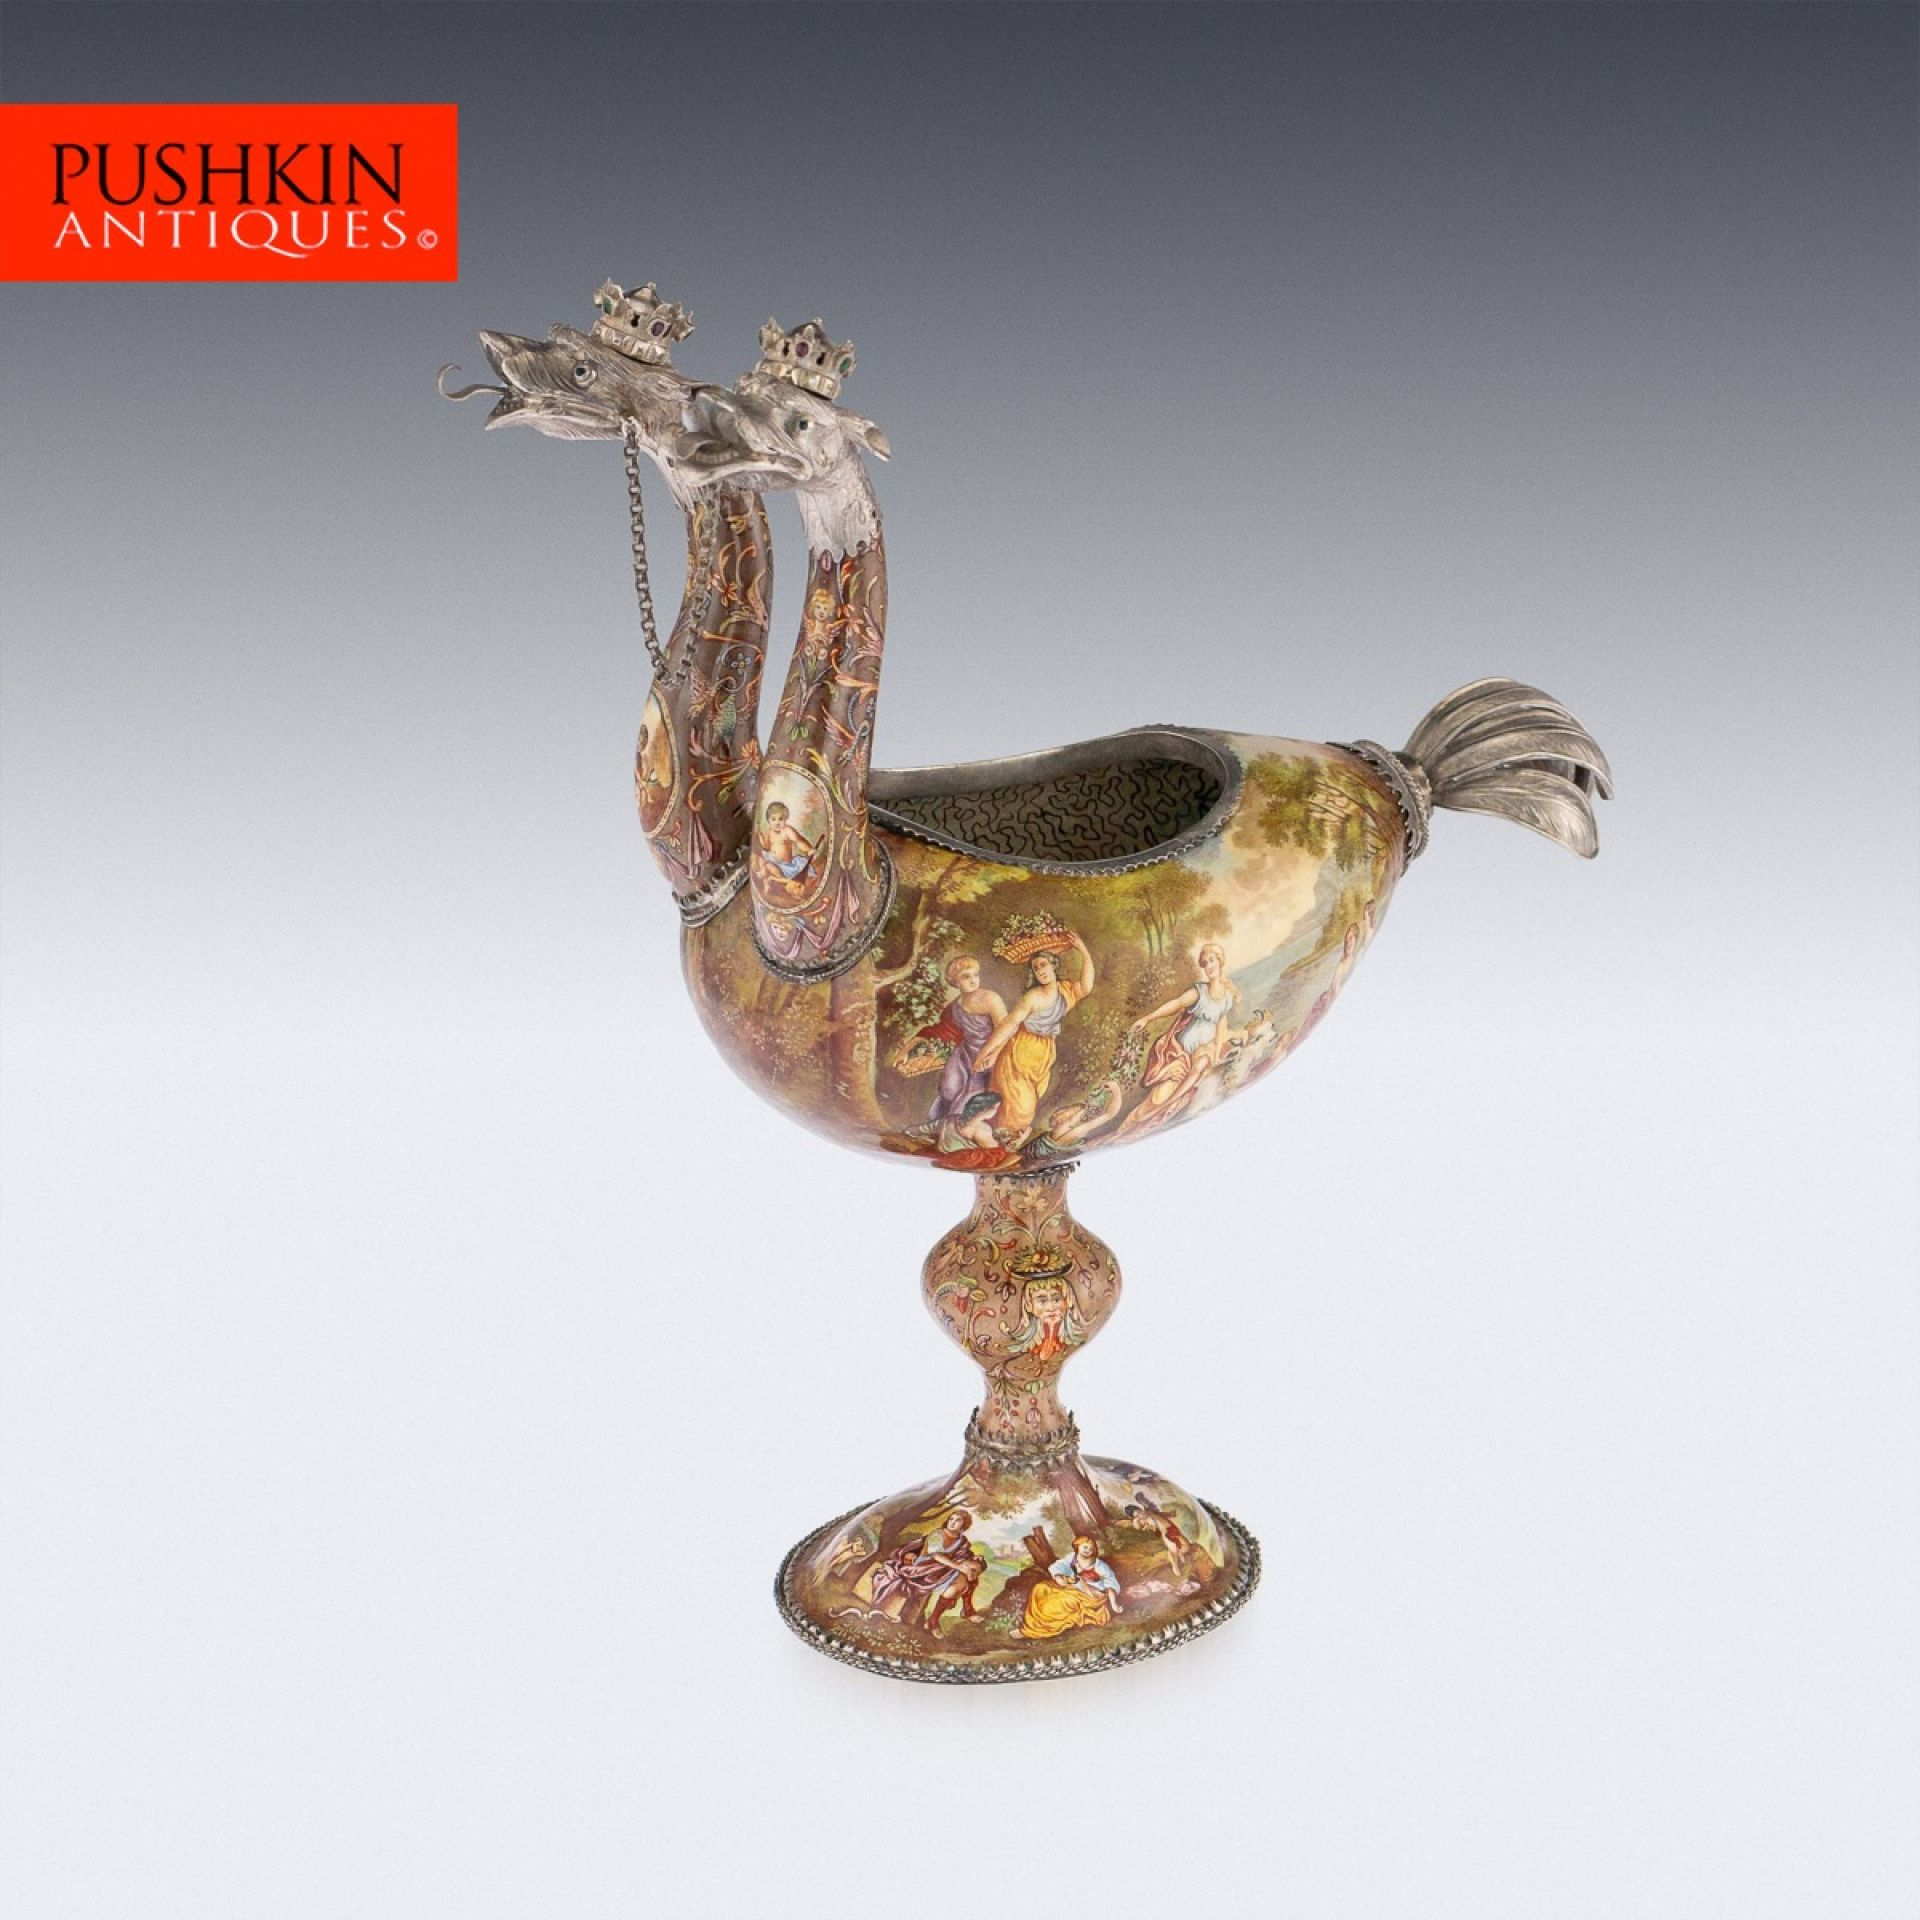 ANTIQUE 19thC AUSTRIAN SOLID SILVER & ENAMEL OSTRICH CUP, RUDOLF LINKE c.1890